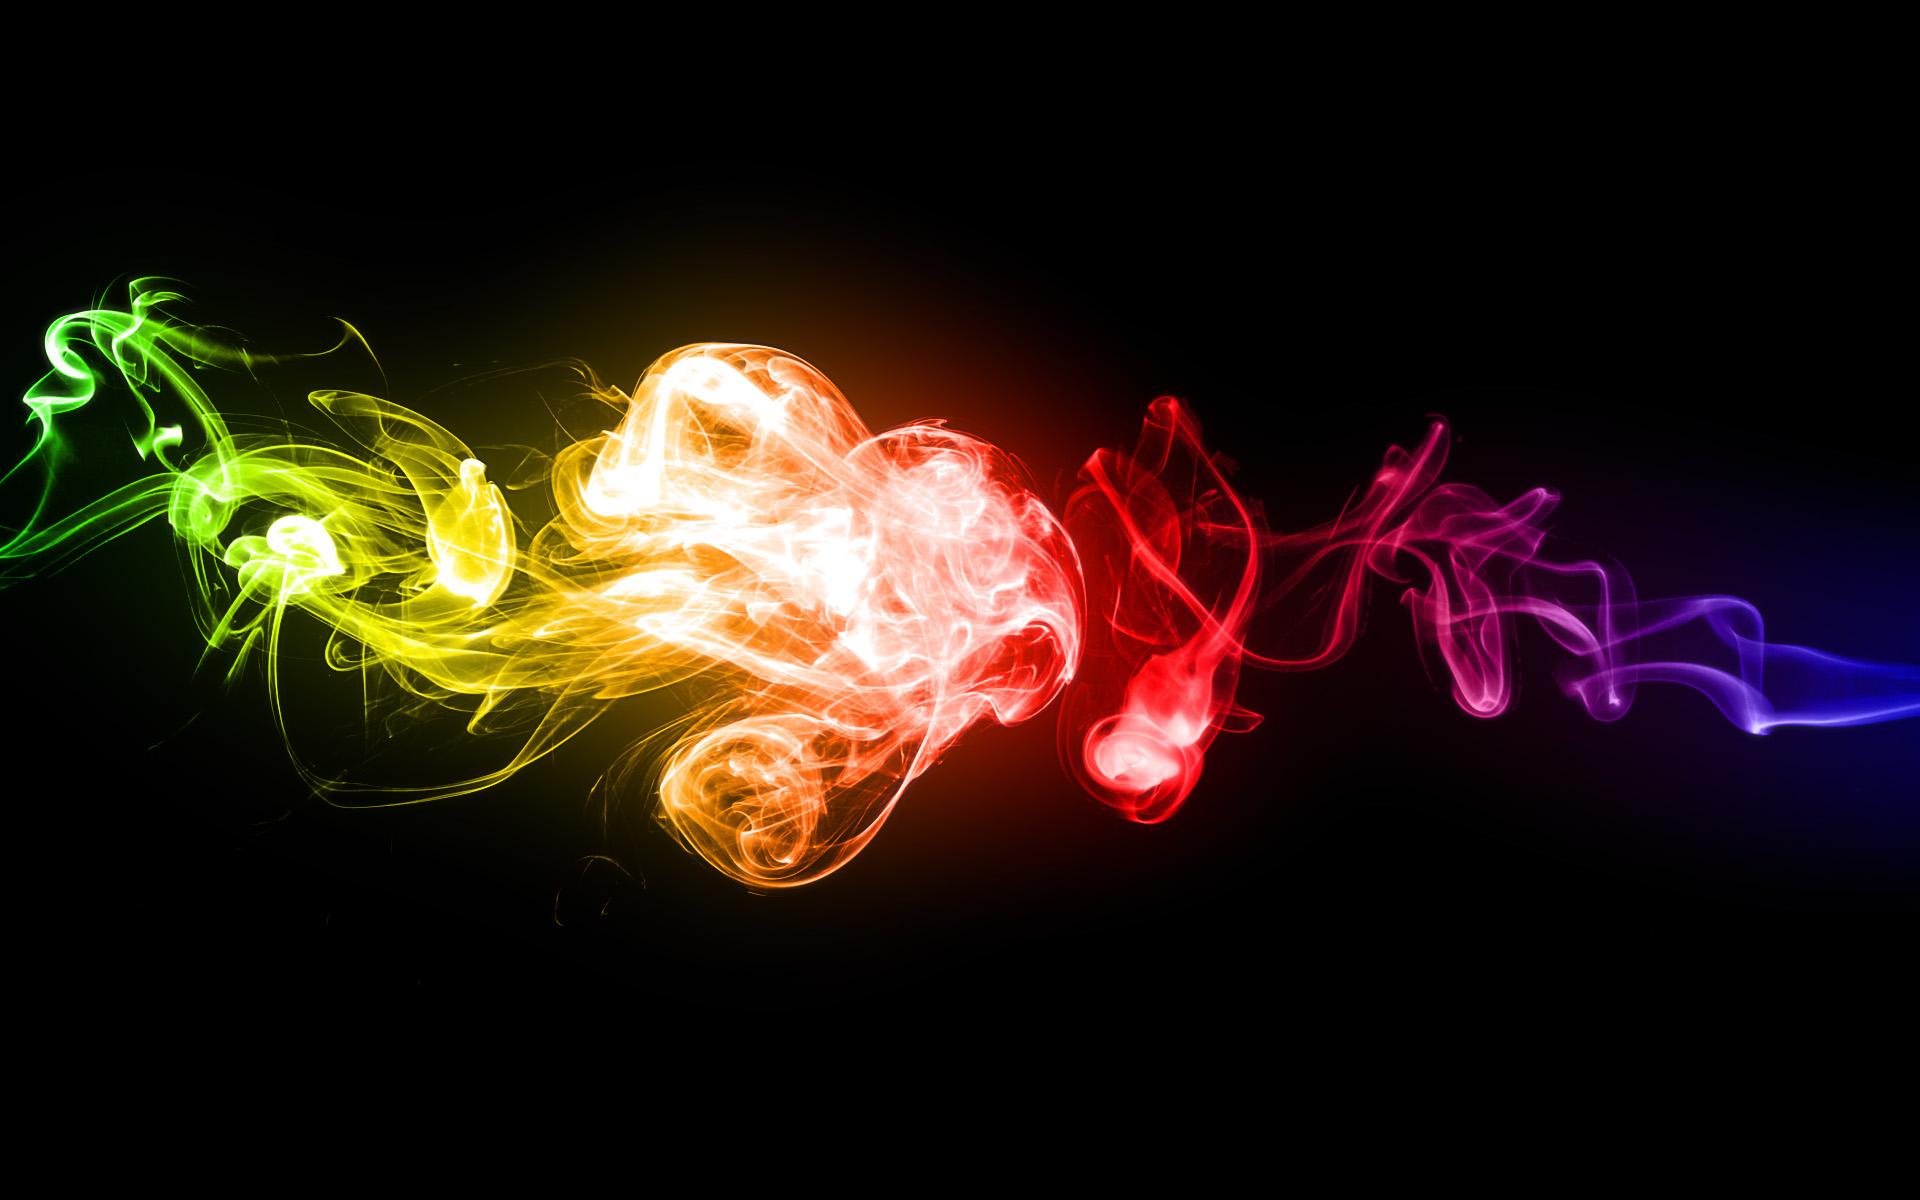 abstract smoke wallpaper 27446 1920x1200 px ~ hdwallsource